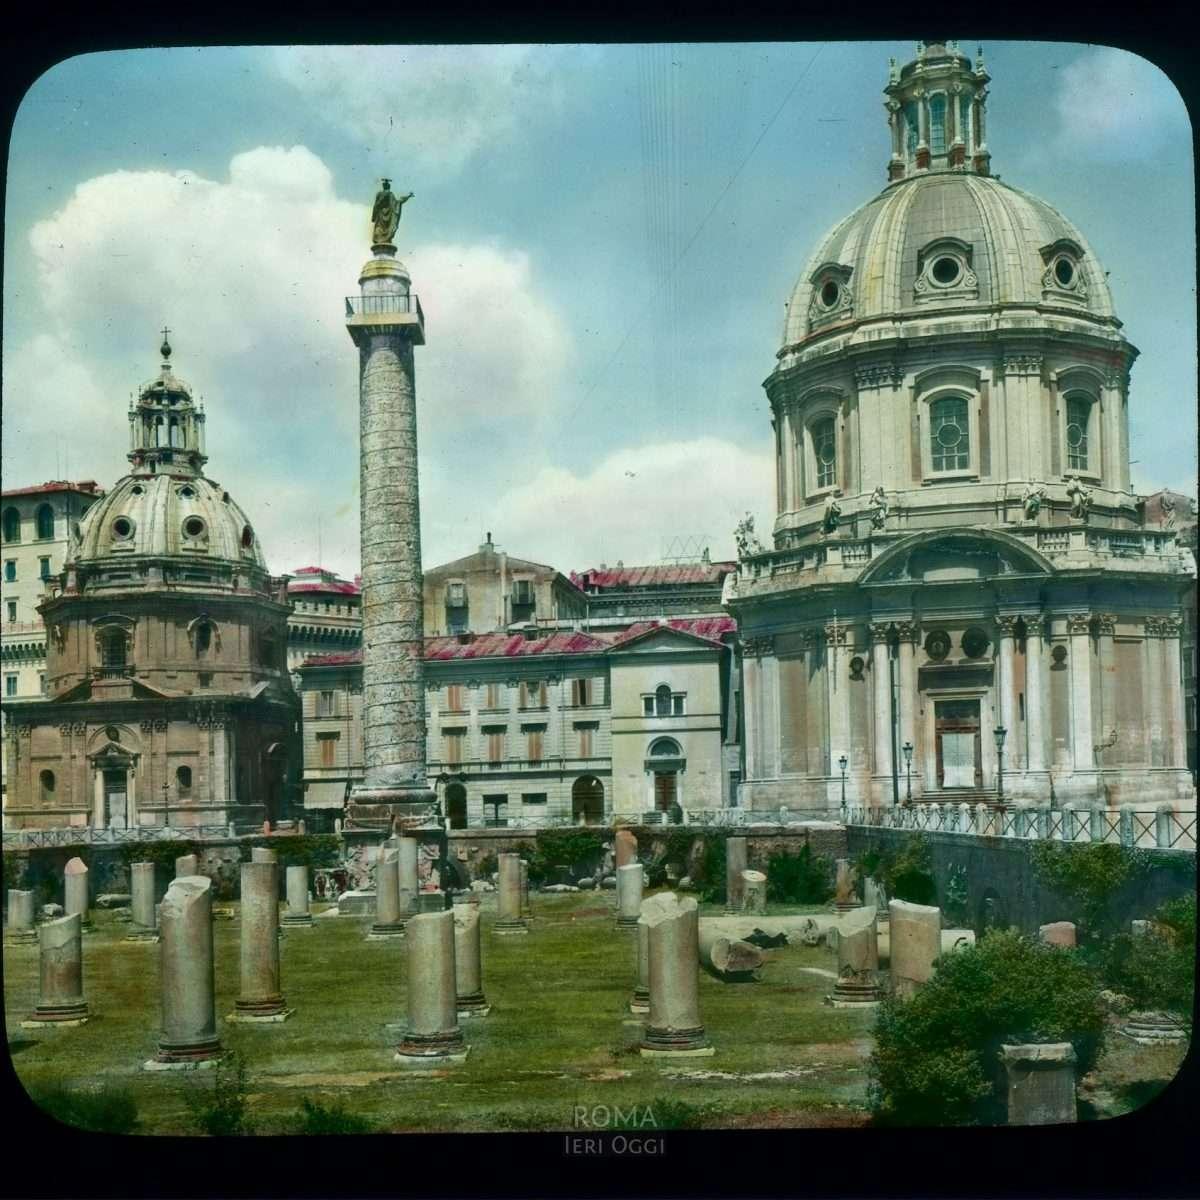 Rome. Trajan's Forum: Trajan's Column and two churches, Santa Maria di Loreto and Santissimo Nome di Maria View in tinted lantern slide, ca. 1919-1938. The column dates from 113 C.E., Santa Maria di Loreto from the 16th century, and Santissimo Nome di Maria, by Antoine Derize, from 1736-1741.